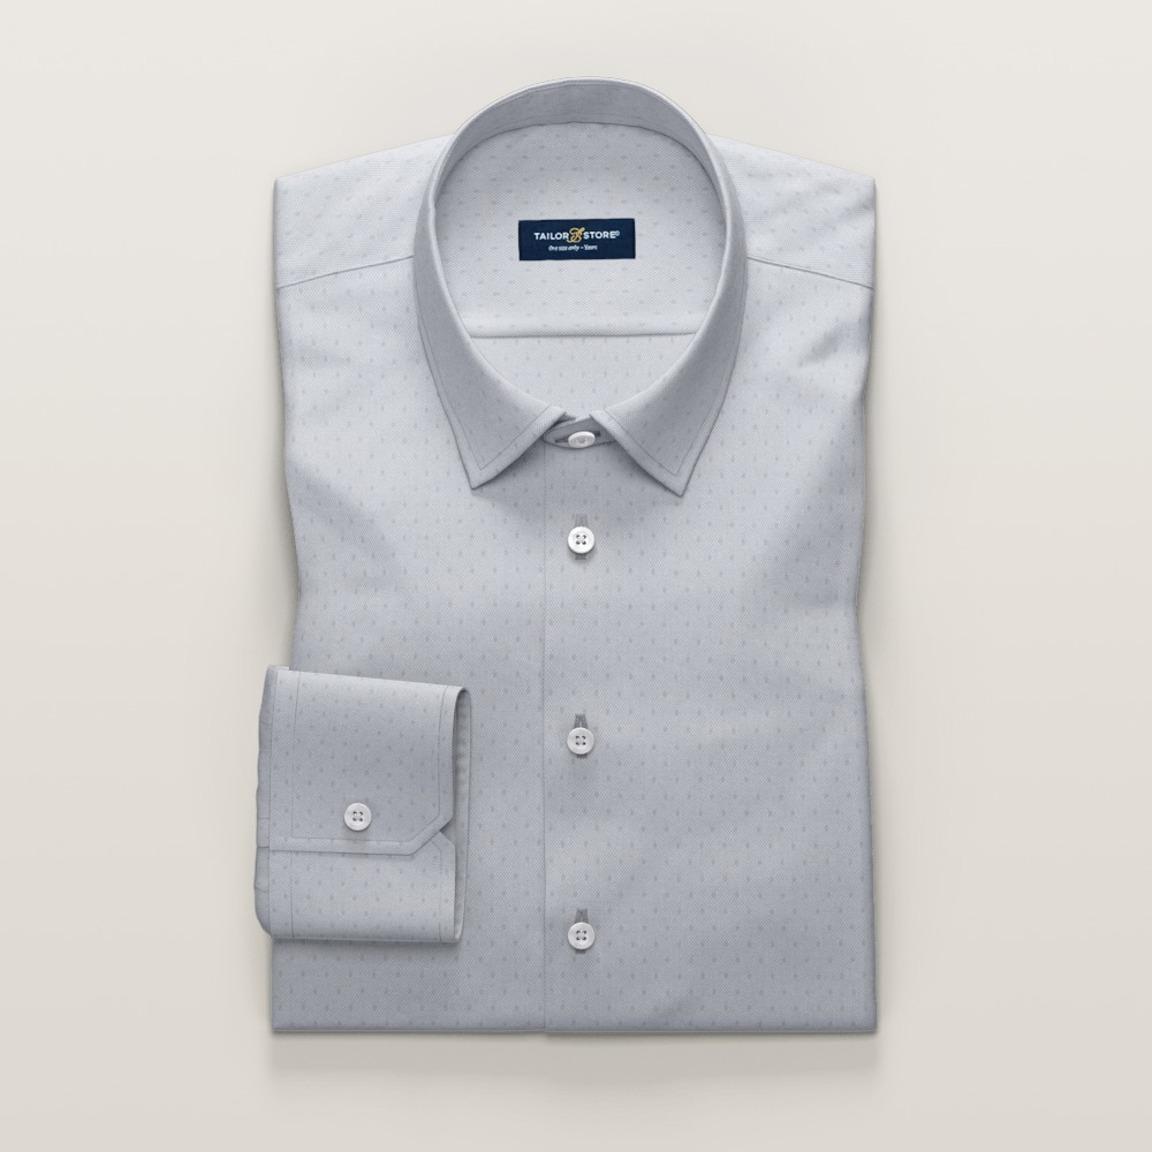 Hellgraues Business-Luxury-Hemd aus Ratière-Gewebe